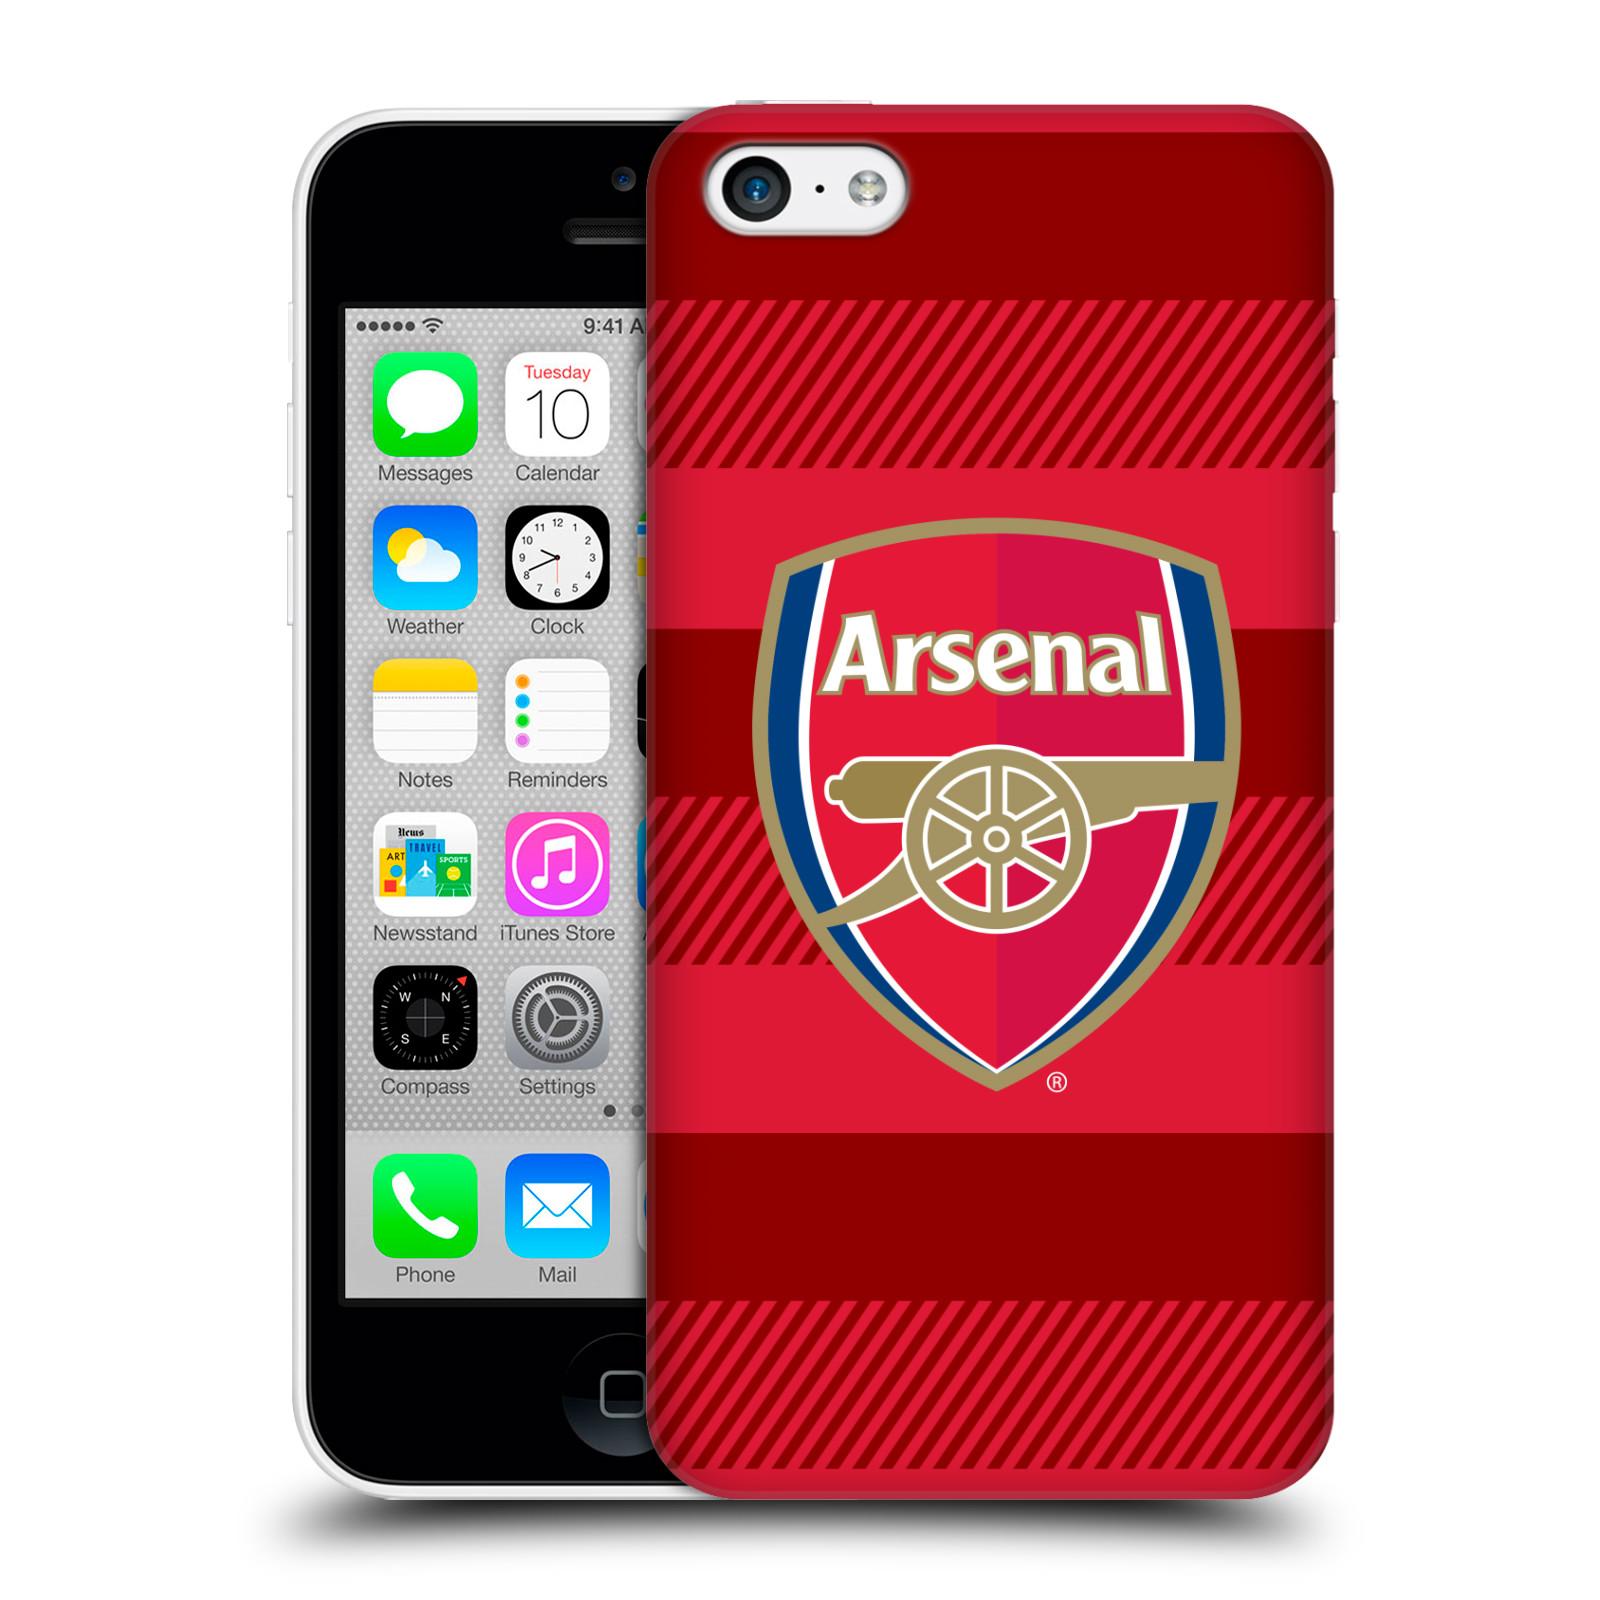 Plastové pouzdro na mobil Apple iPhone 5C - Head Case - Arsenal FC - Logo s pruhy